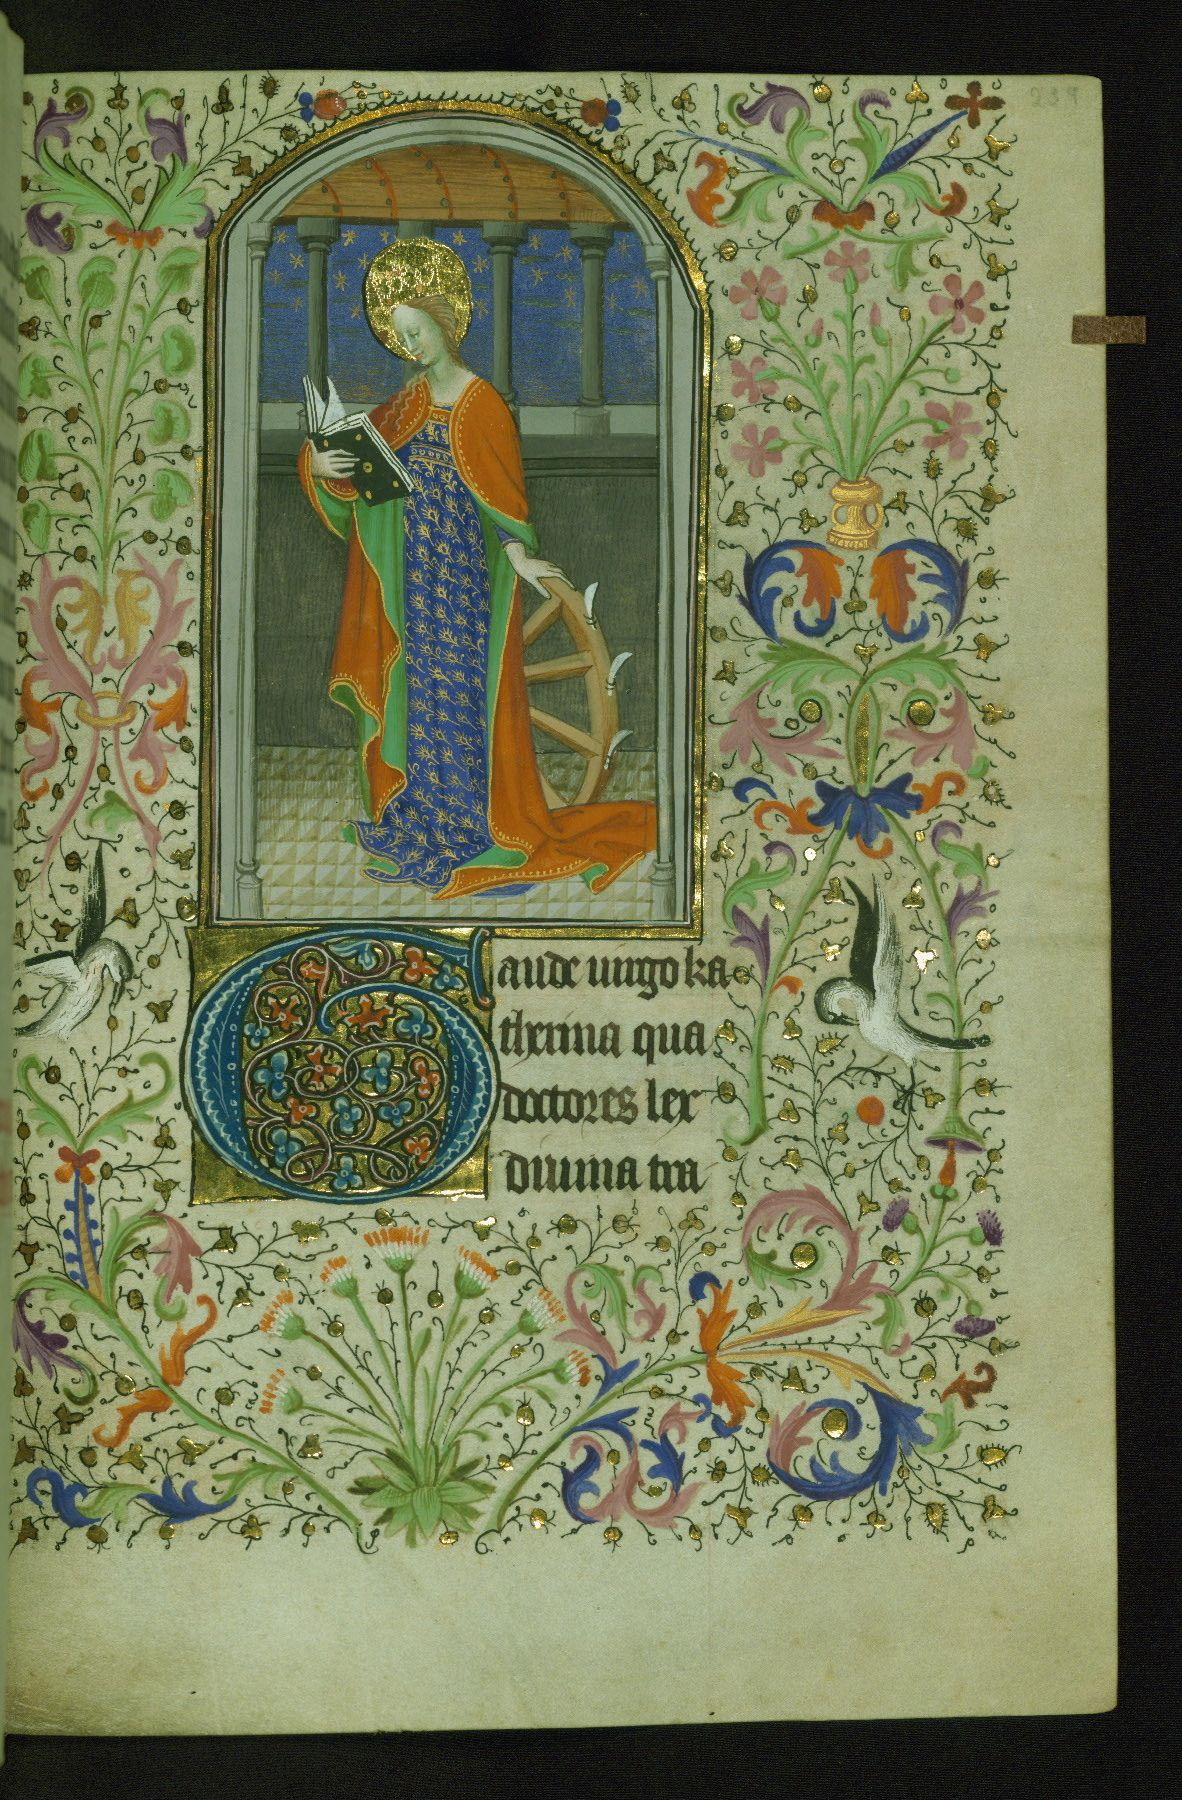 Malet-Lannoy Hours, St. Catherine, Walters Manuscript W.281, fol. 239r by Walters Art Museum Illuminated Manuscripts http://flic.kr/p/zFnPQx